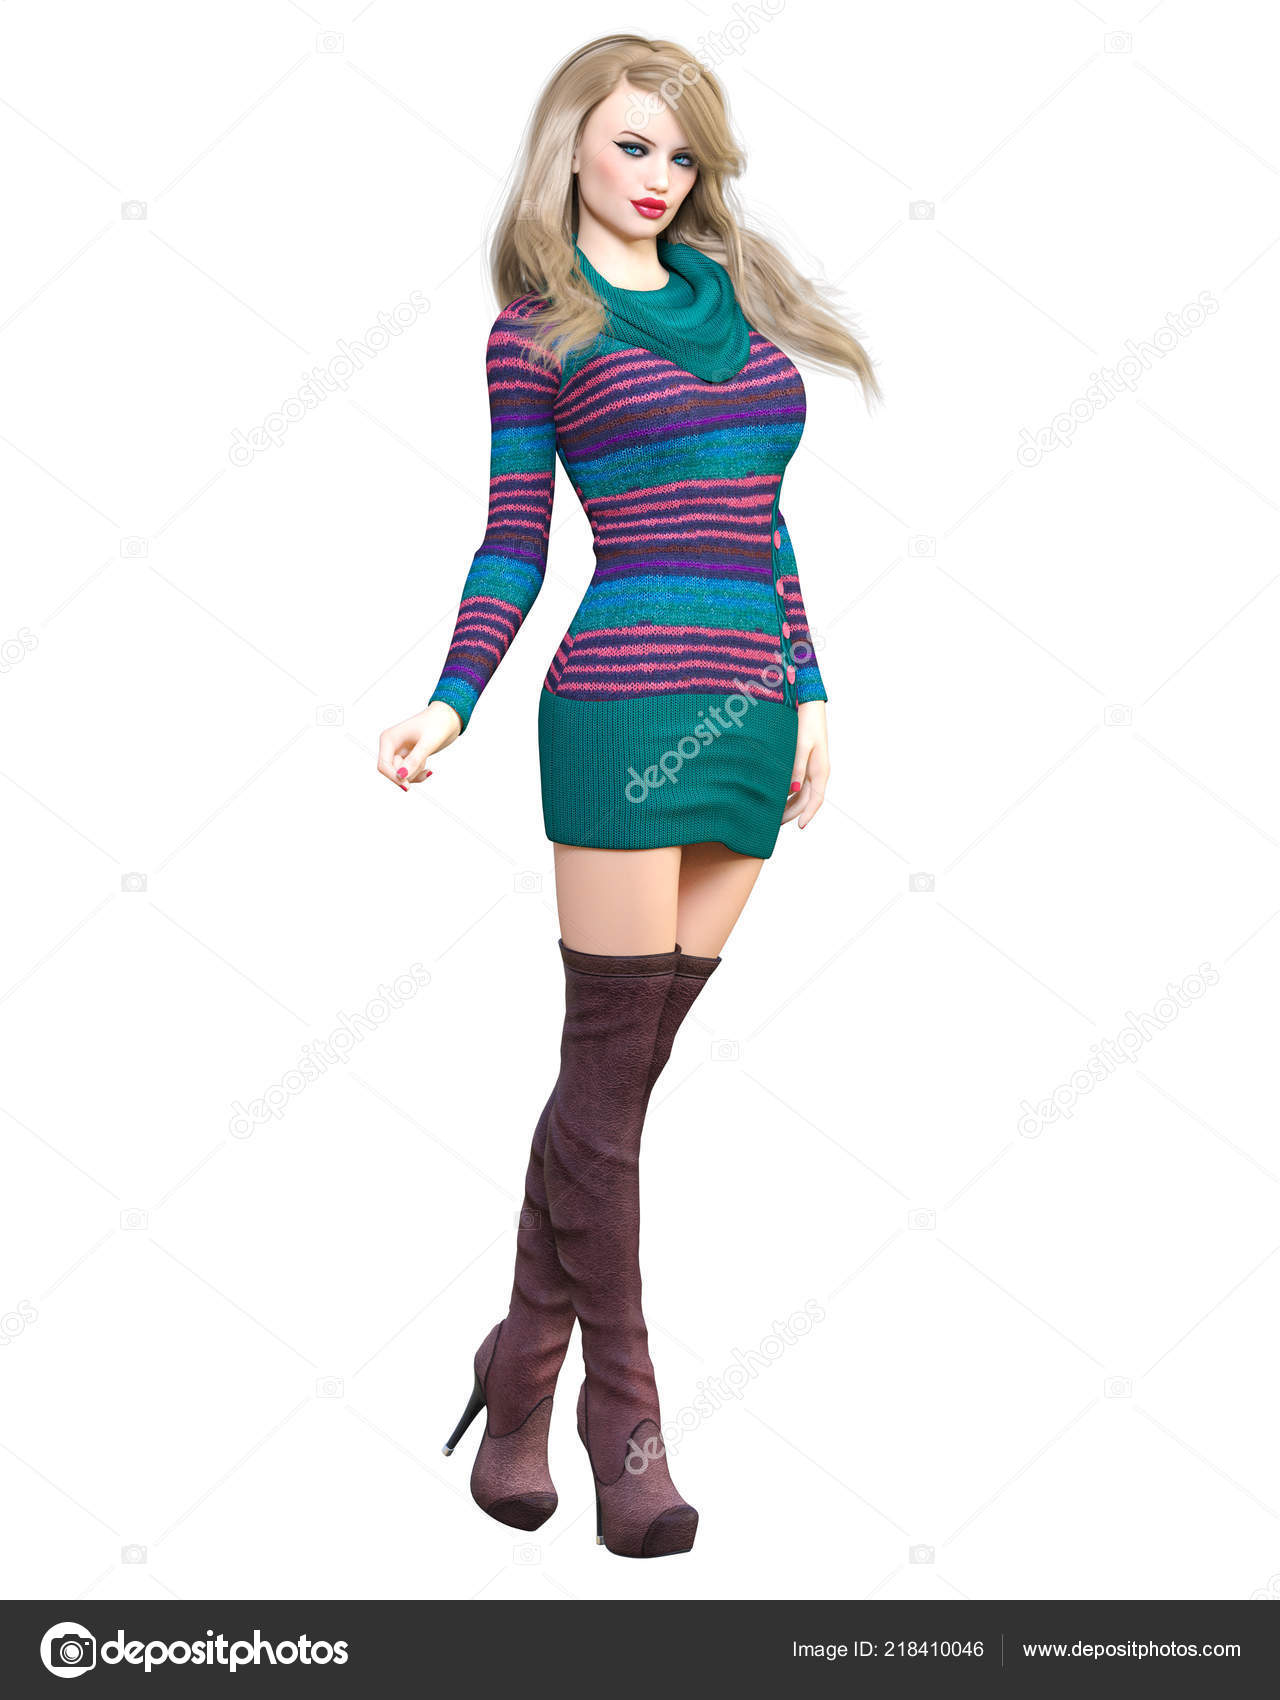 3c54e1cc6d8 3D schöne blonde kurze gestrickte Tunika Kleid lange Stiefel. Frühling-Herbst-Kollektion  Kleider. Helles Make-up. Frau Studiofotografie.